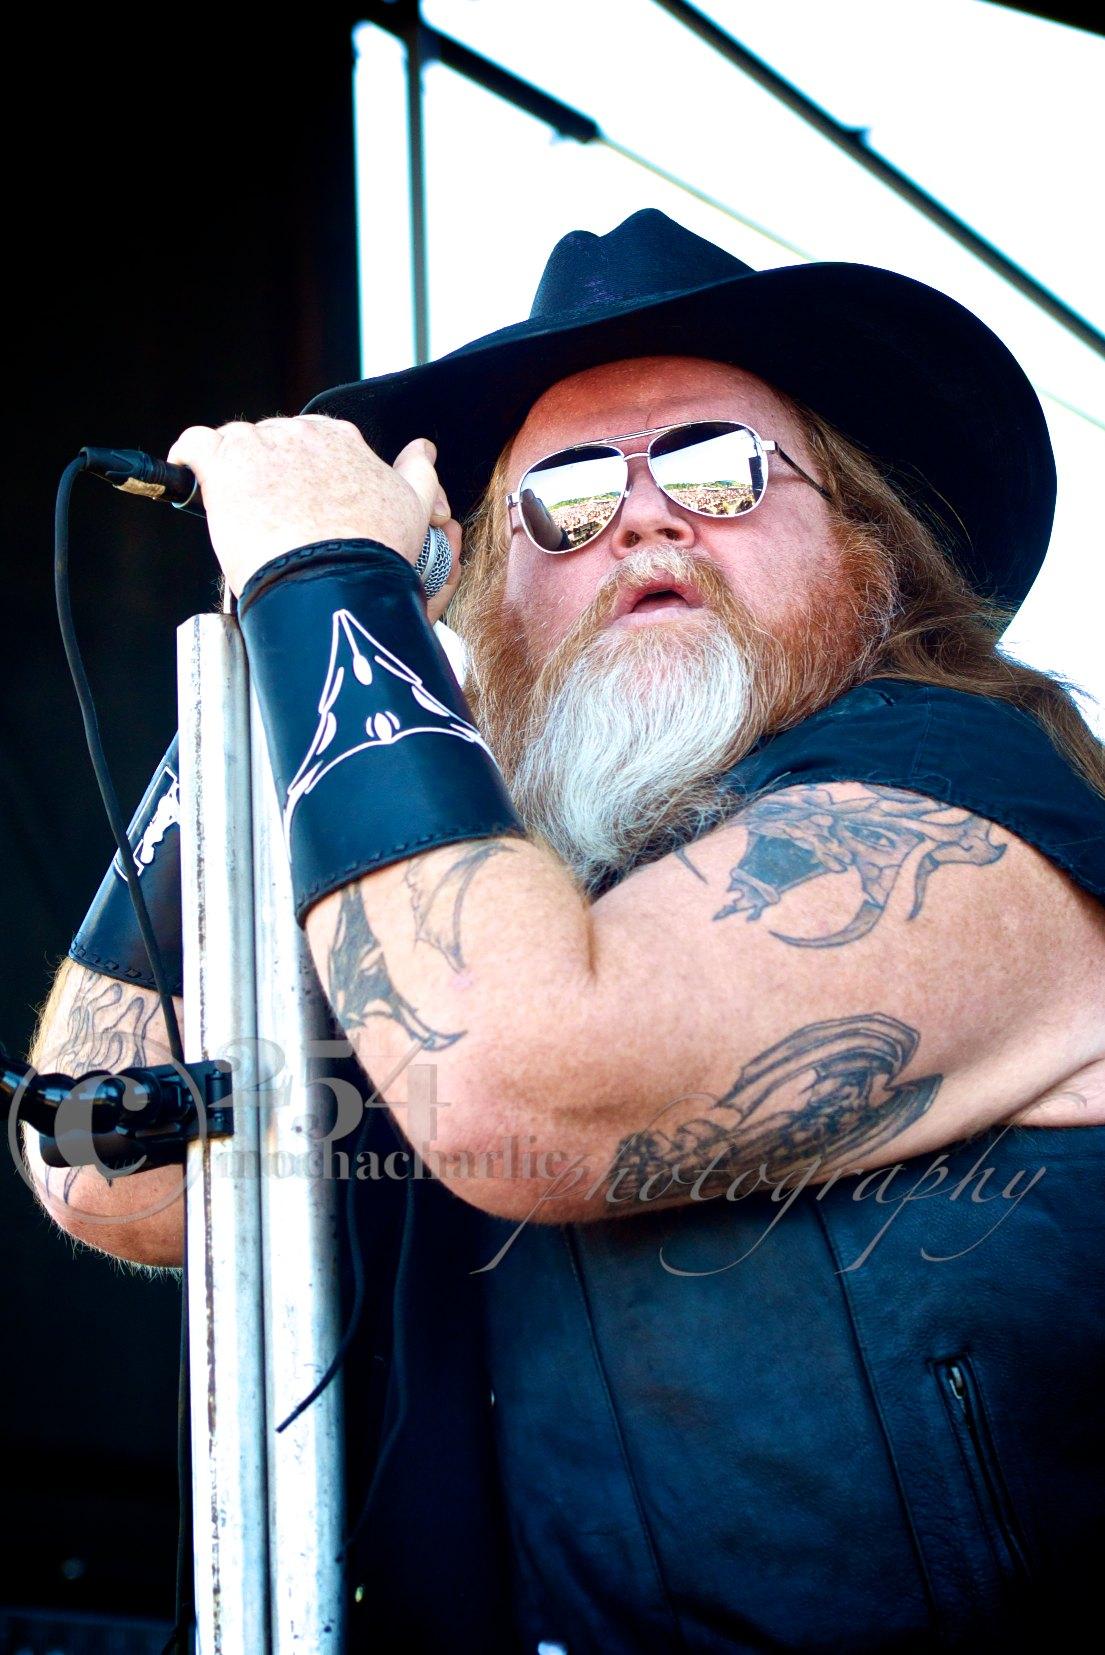 Texas Hippie Coalition at Mayhem Festival (Photo by Mocha Charlie)